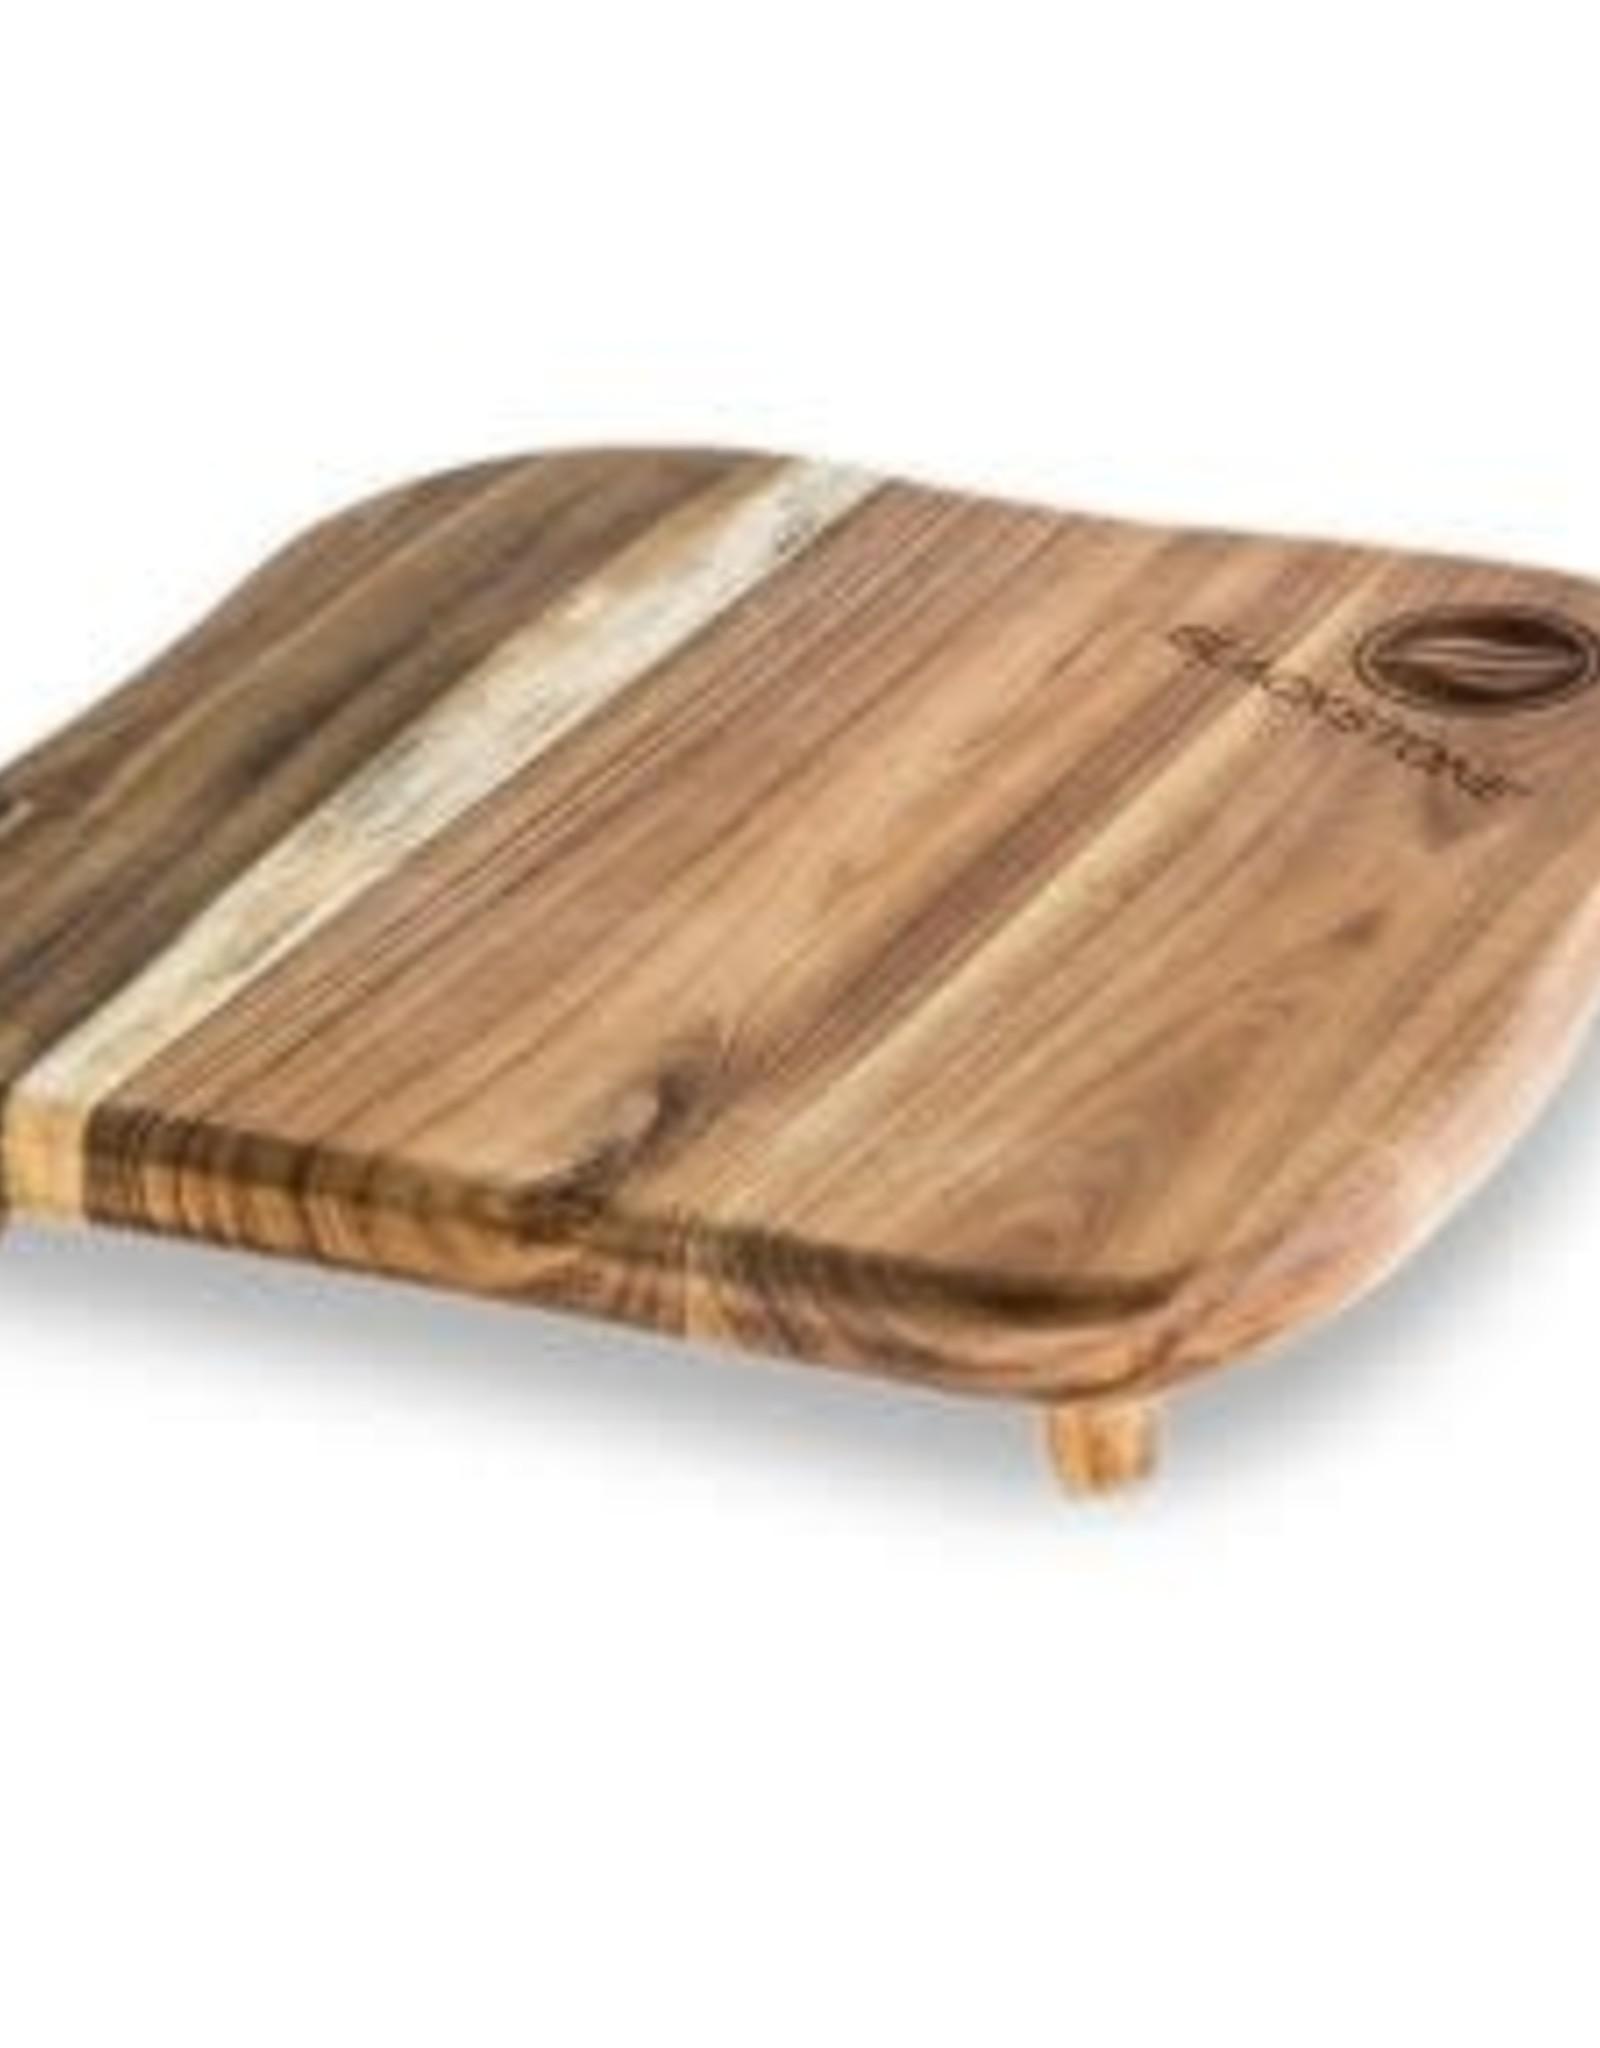 Blackstone Blackstone Griddle Cutting Board 1755